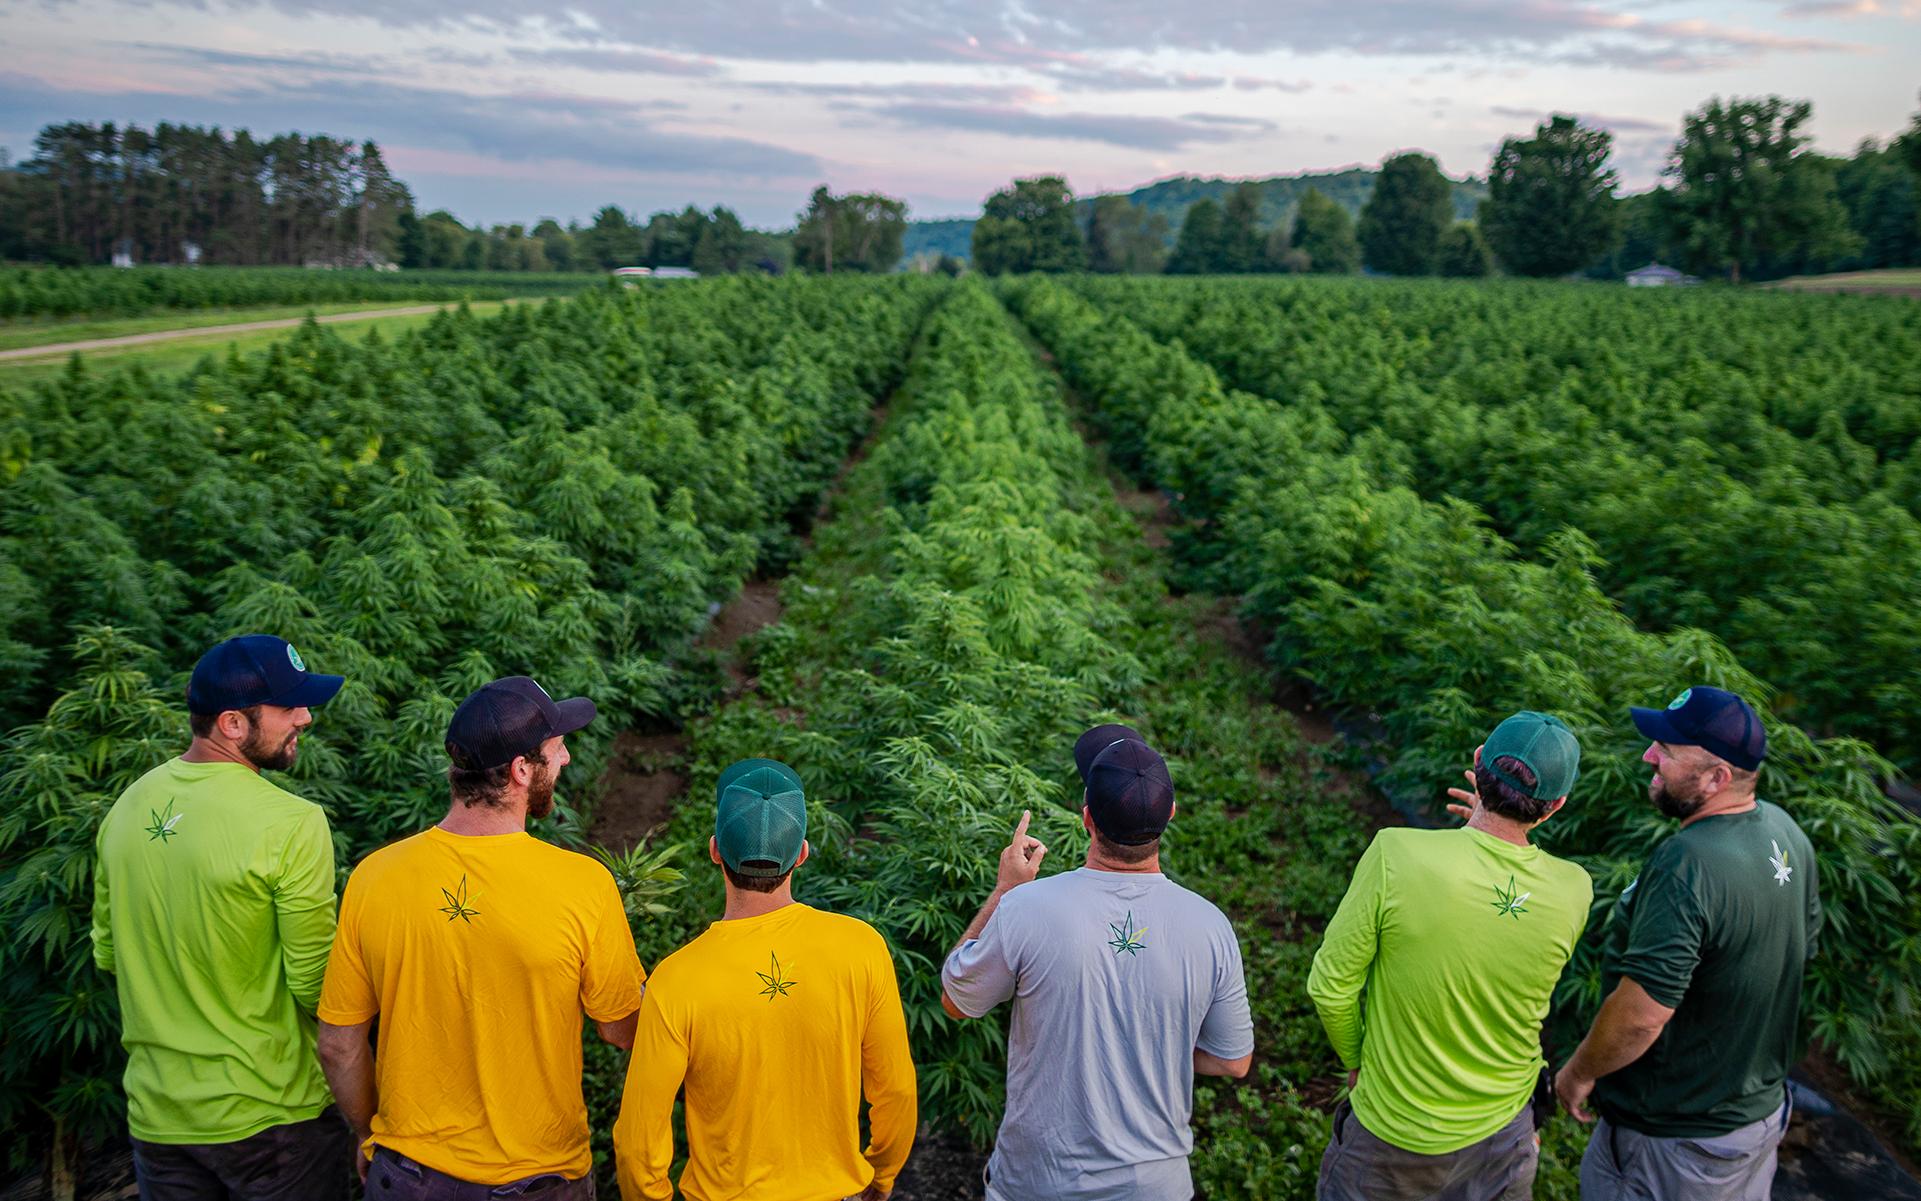 USDA CERTIFIED ORGANIC HIGH cbd and CBG HEMP, organic hemp farm, vermont hemp,